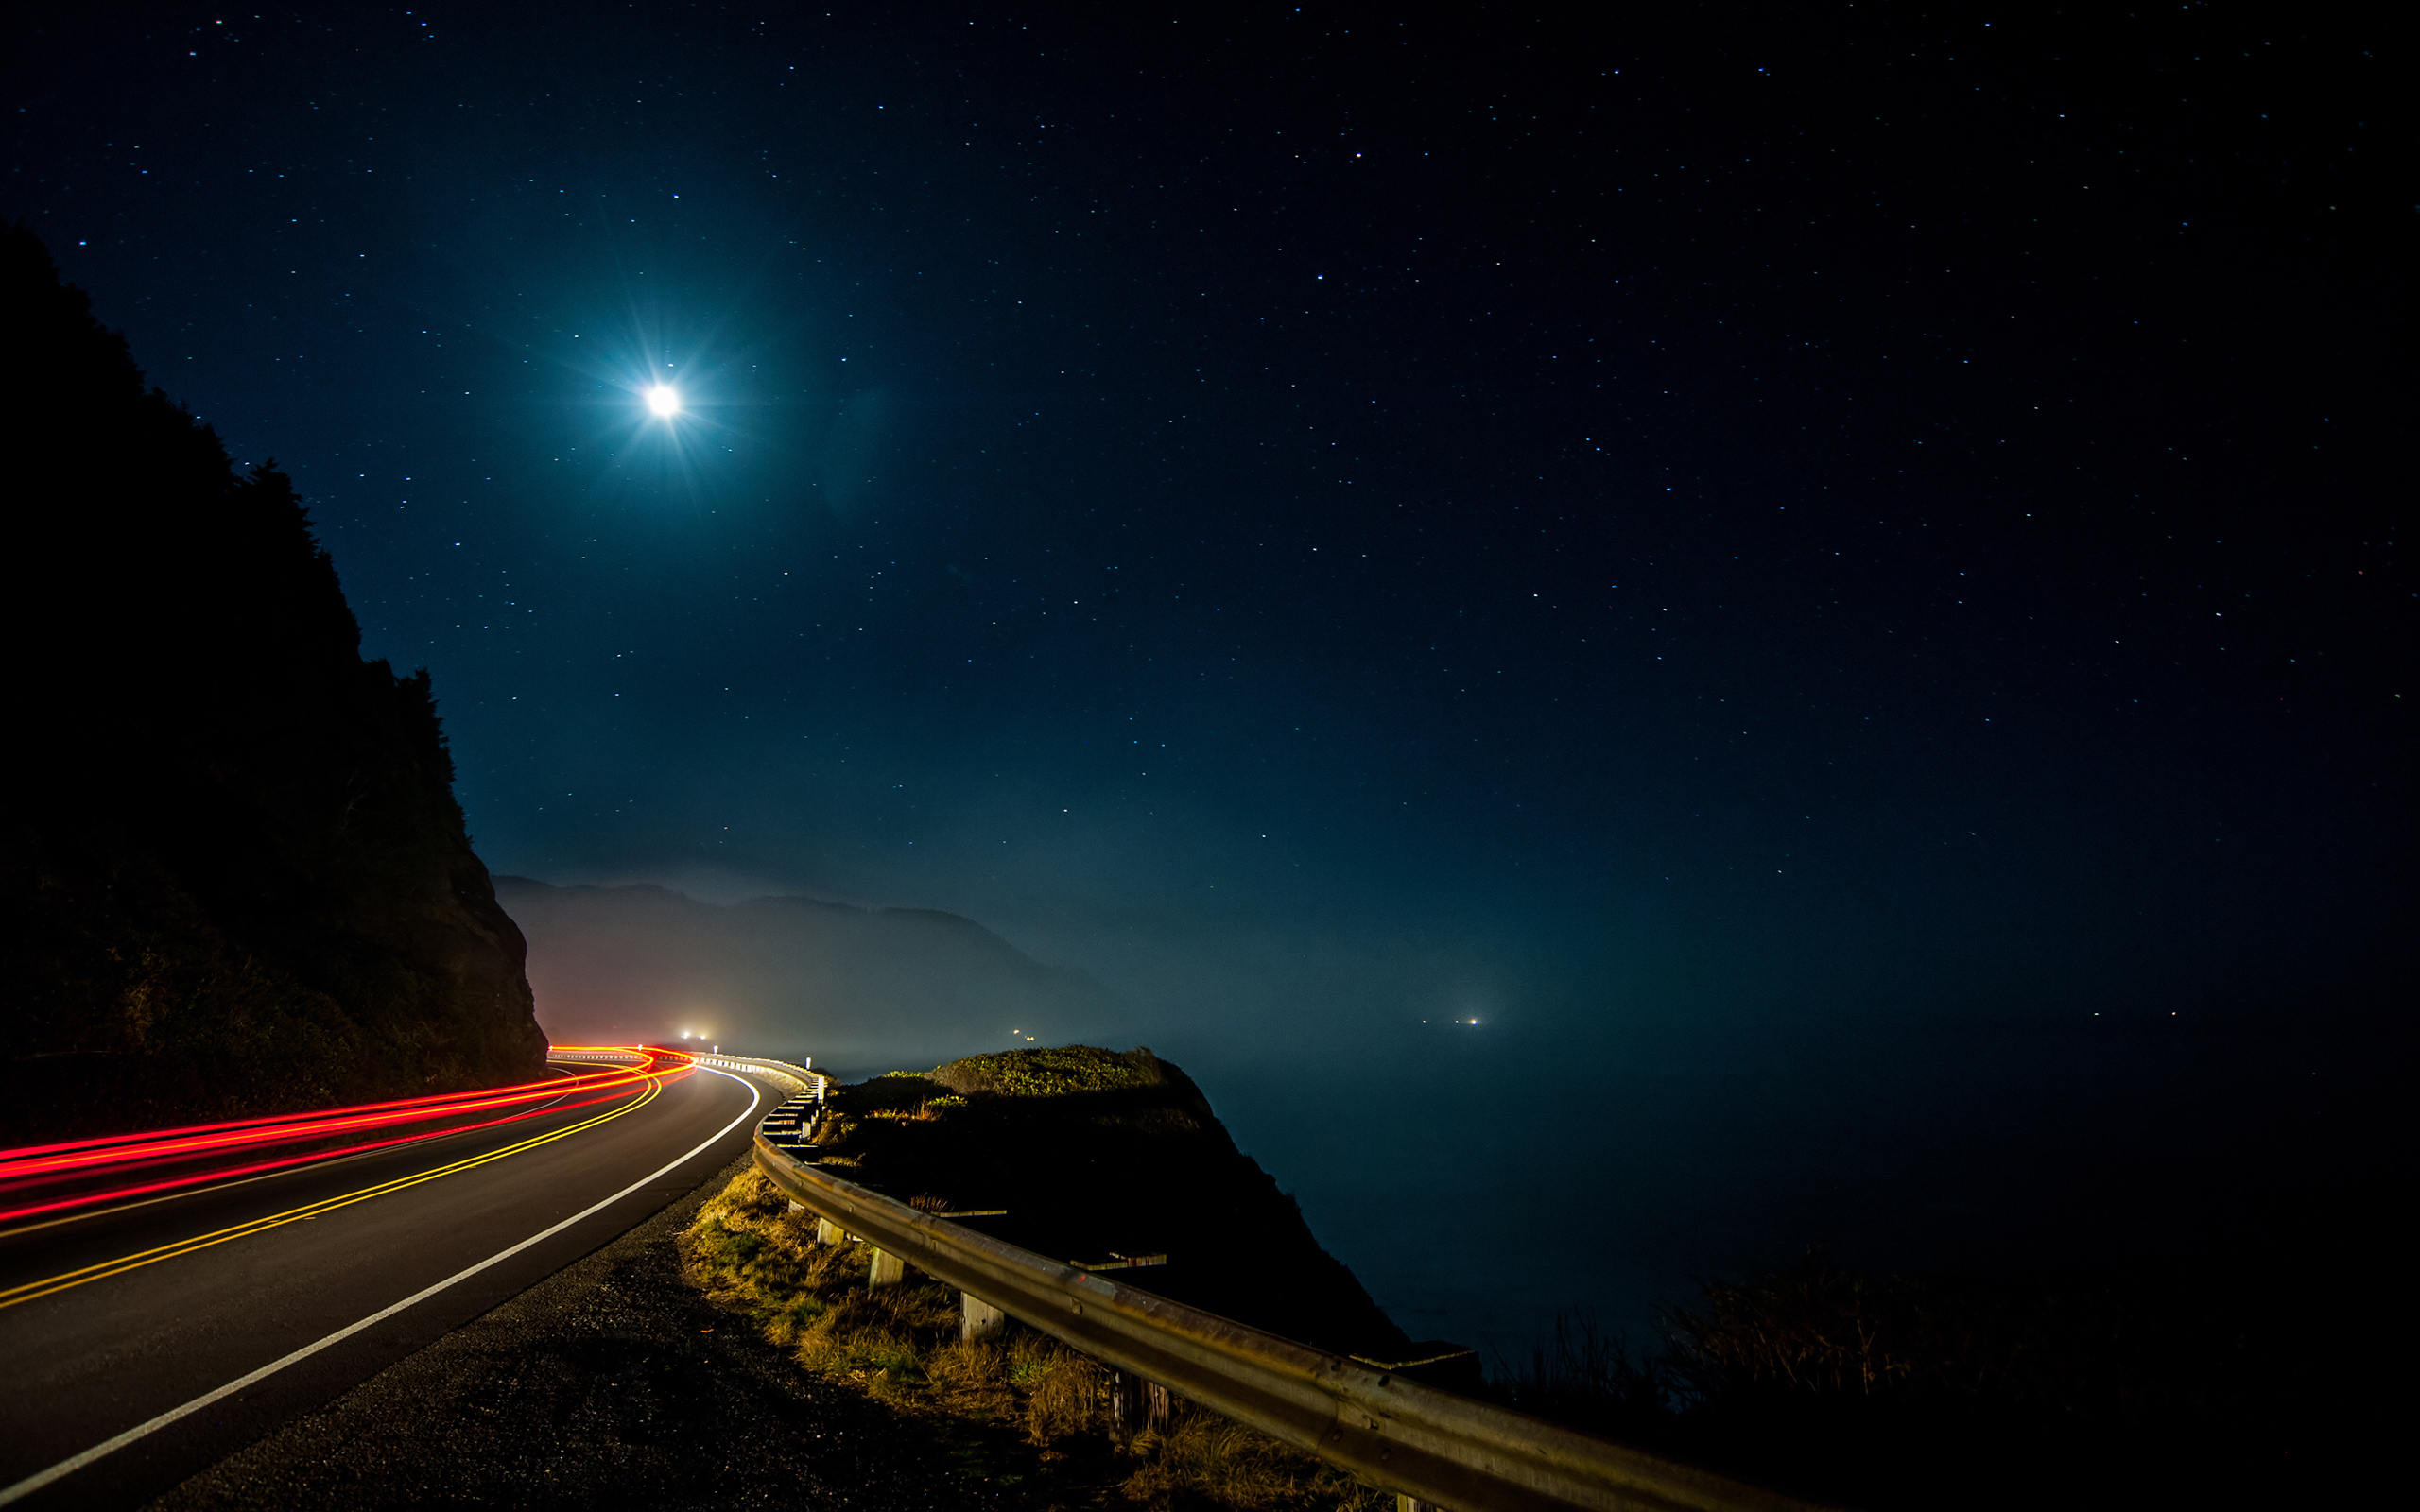 Mountain Road On A Starry Night Papel De Parede Hd Plano De Fundo 2560x1600 Id 707401 Wallpaper Abyss